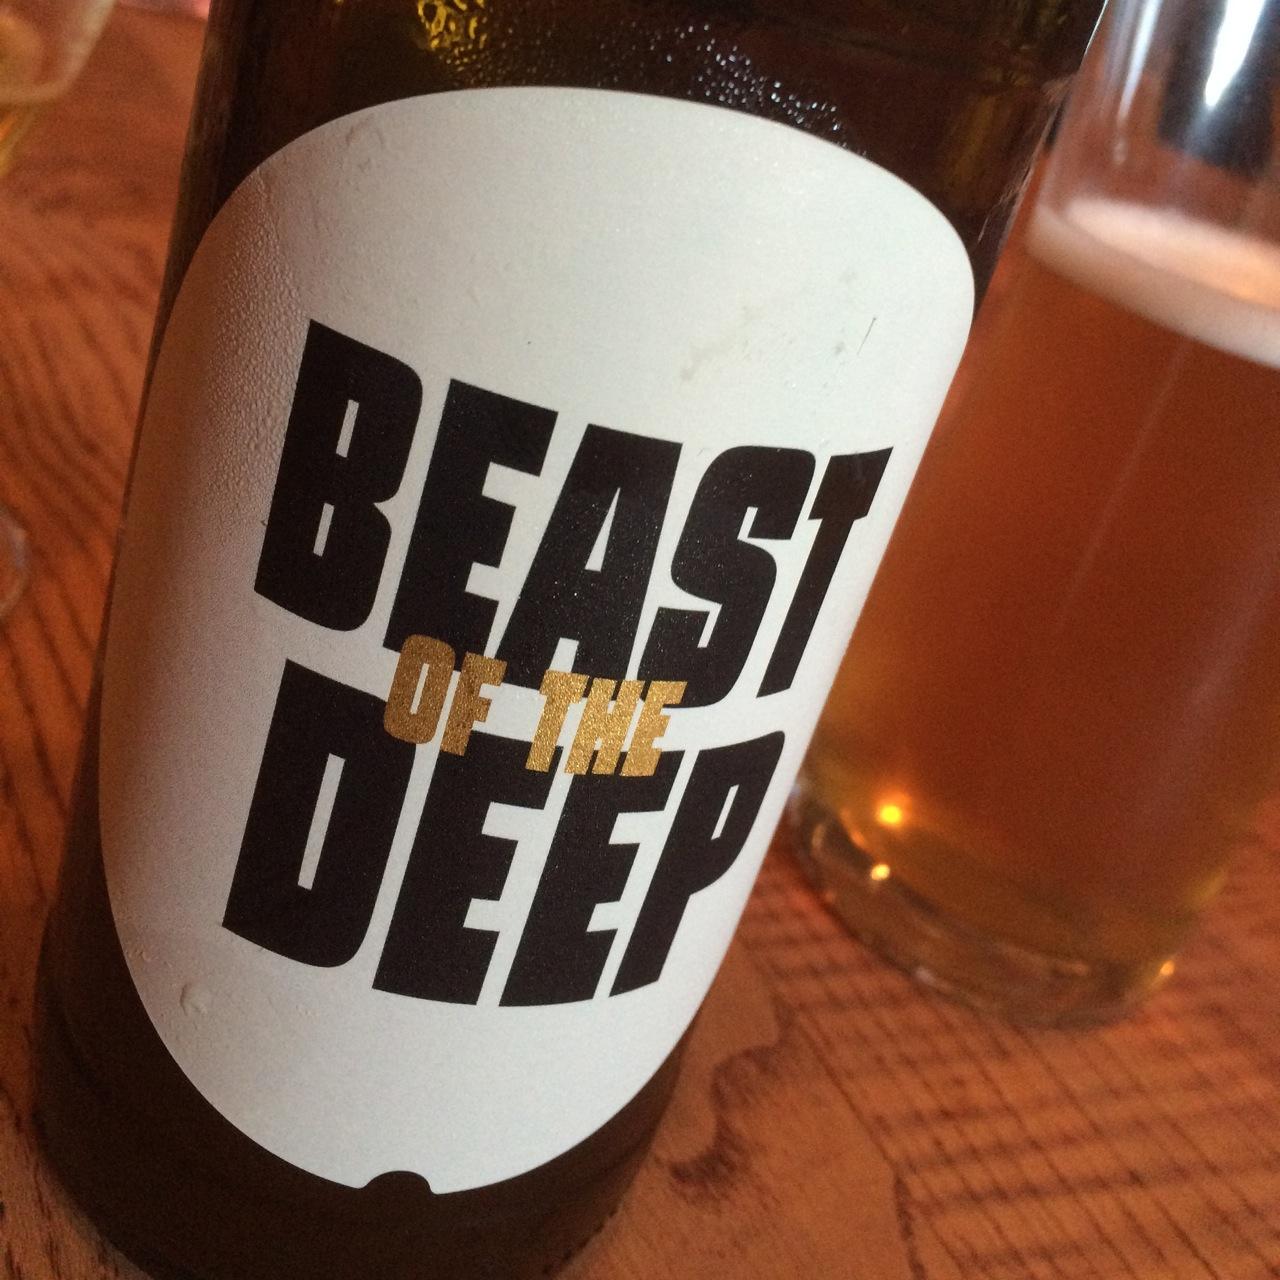 http://i0.wp.com/fatgayvegan.com/wp-content/uploads/2015/07/beast-of-the-deep.jpg?fit=1280%2C1280